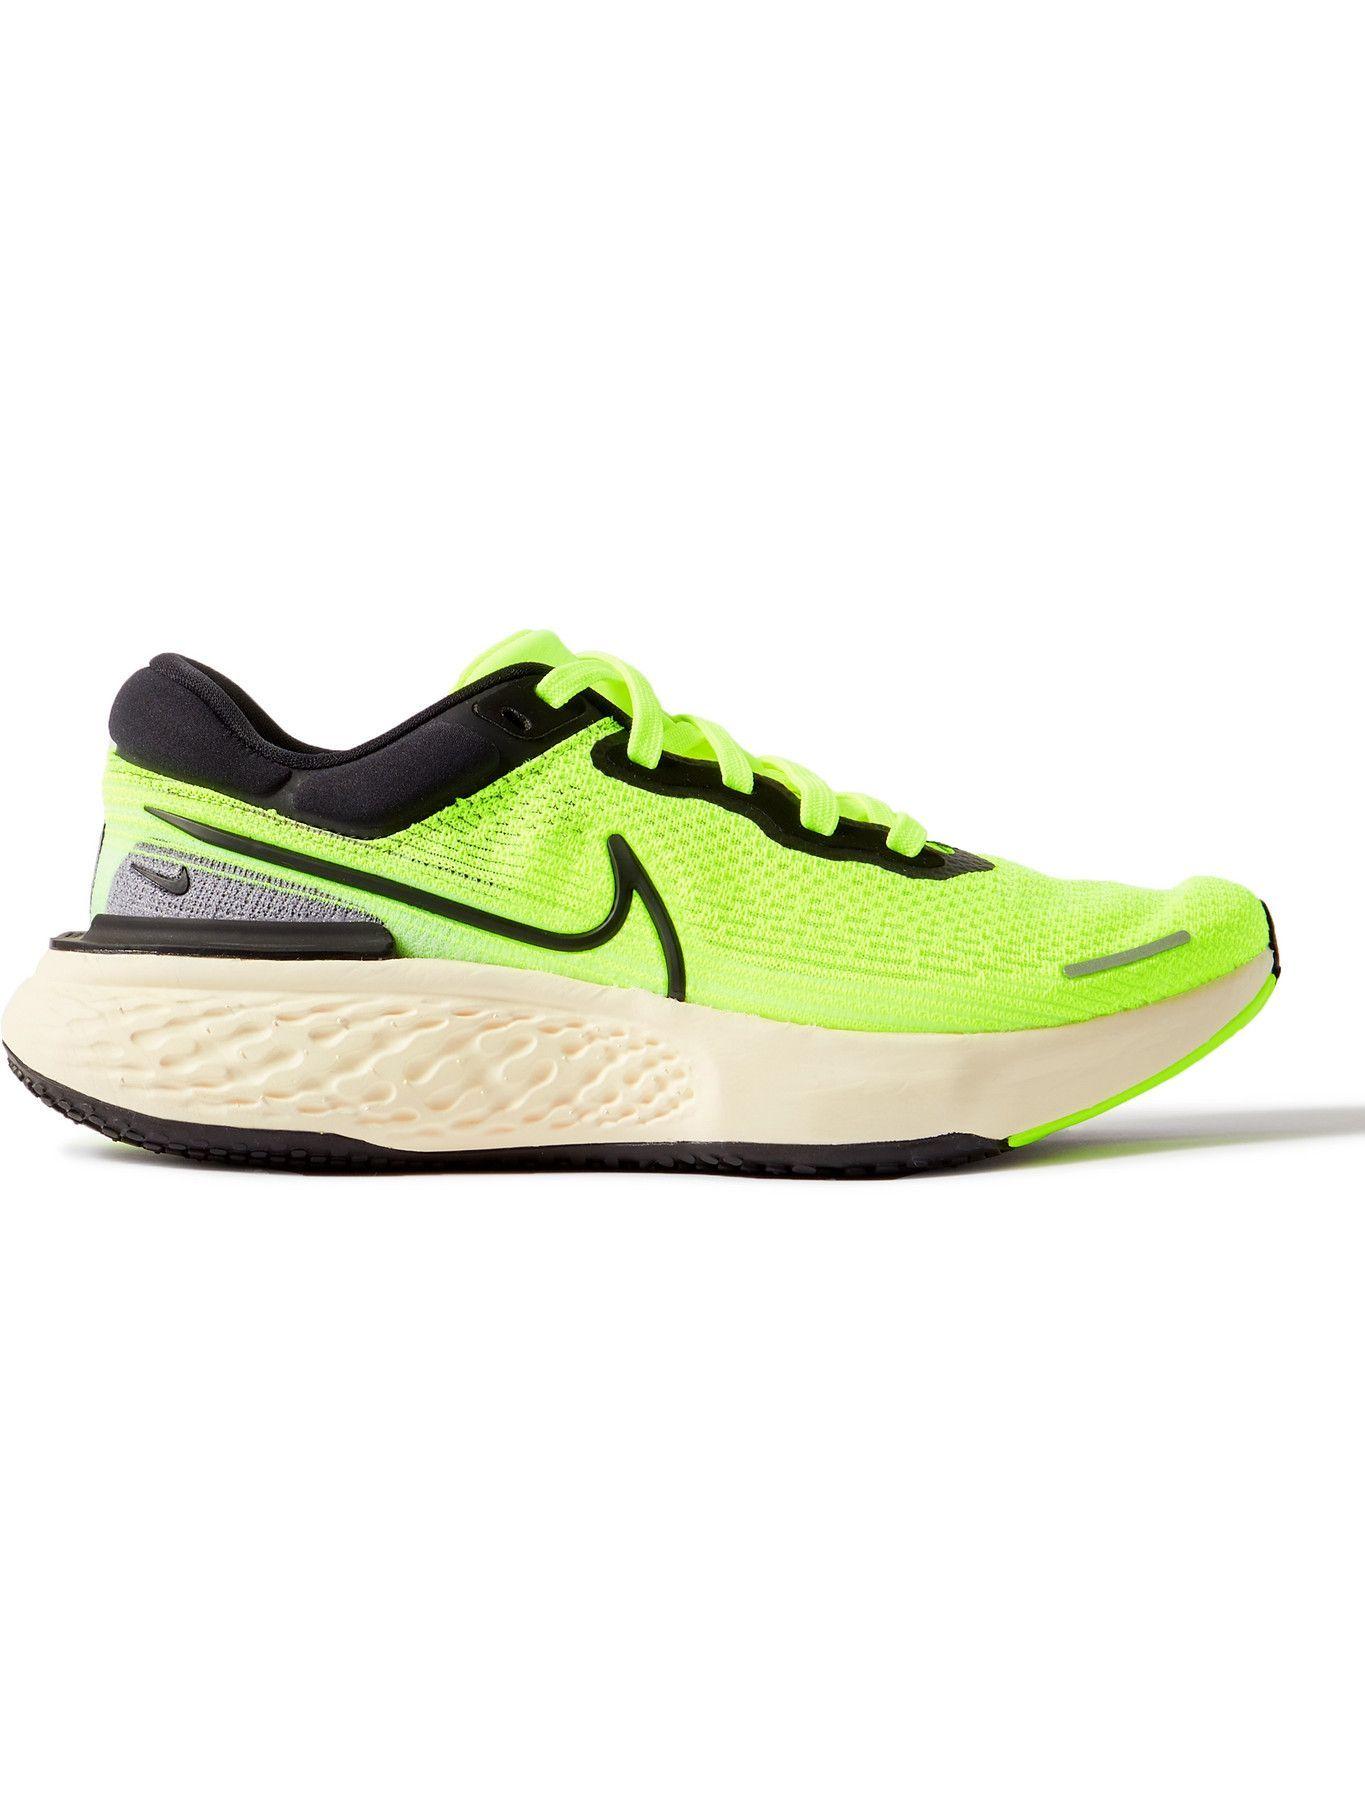 NIKE RUNNING - ZoomX Invincible Run Flyknit Sneakers - Yellow